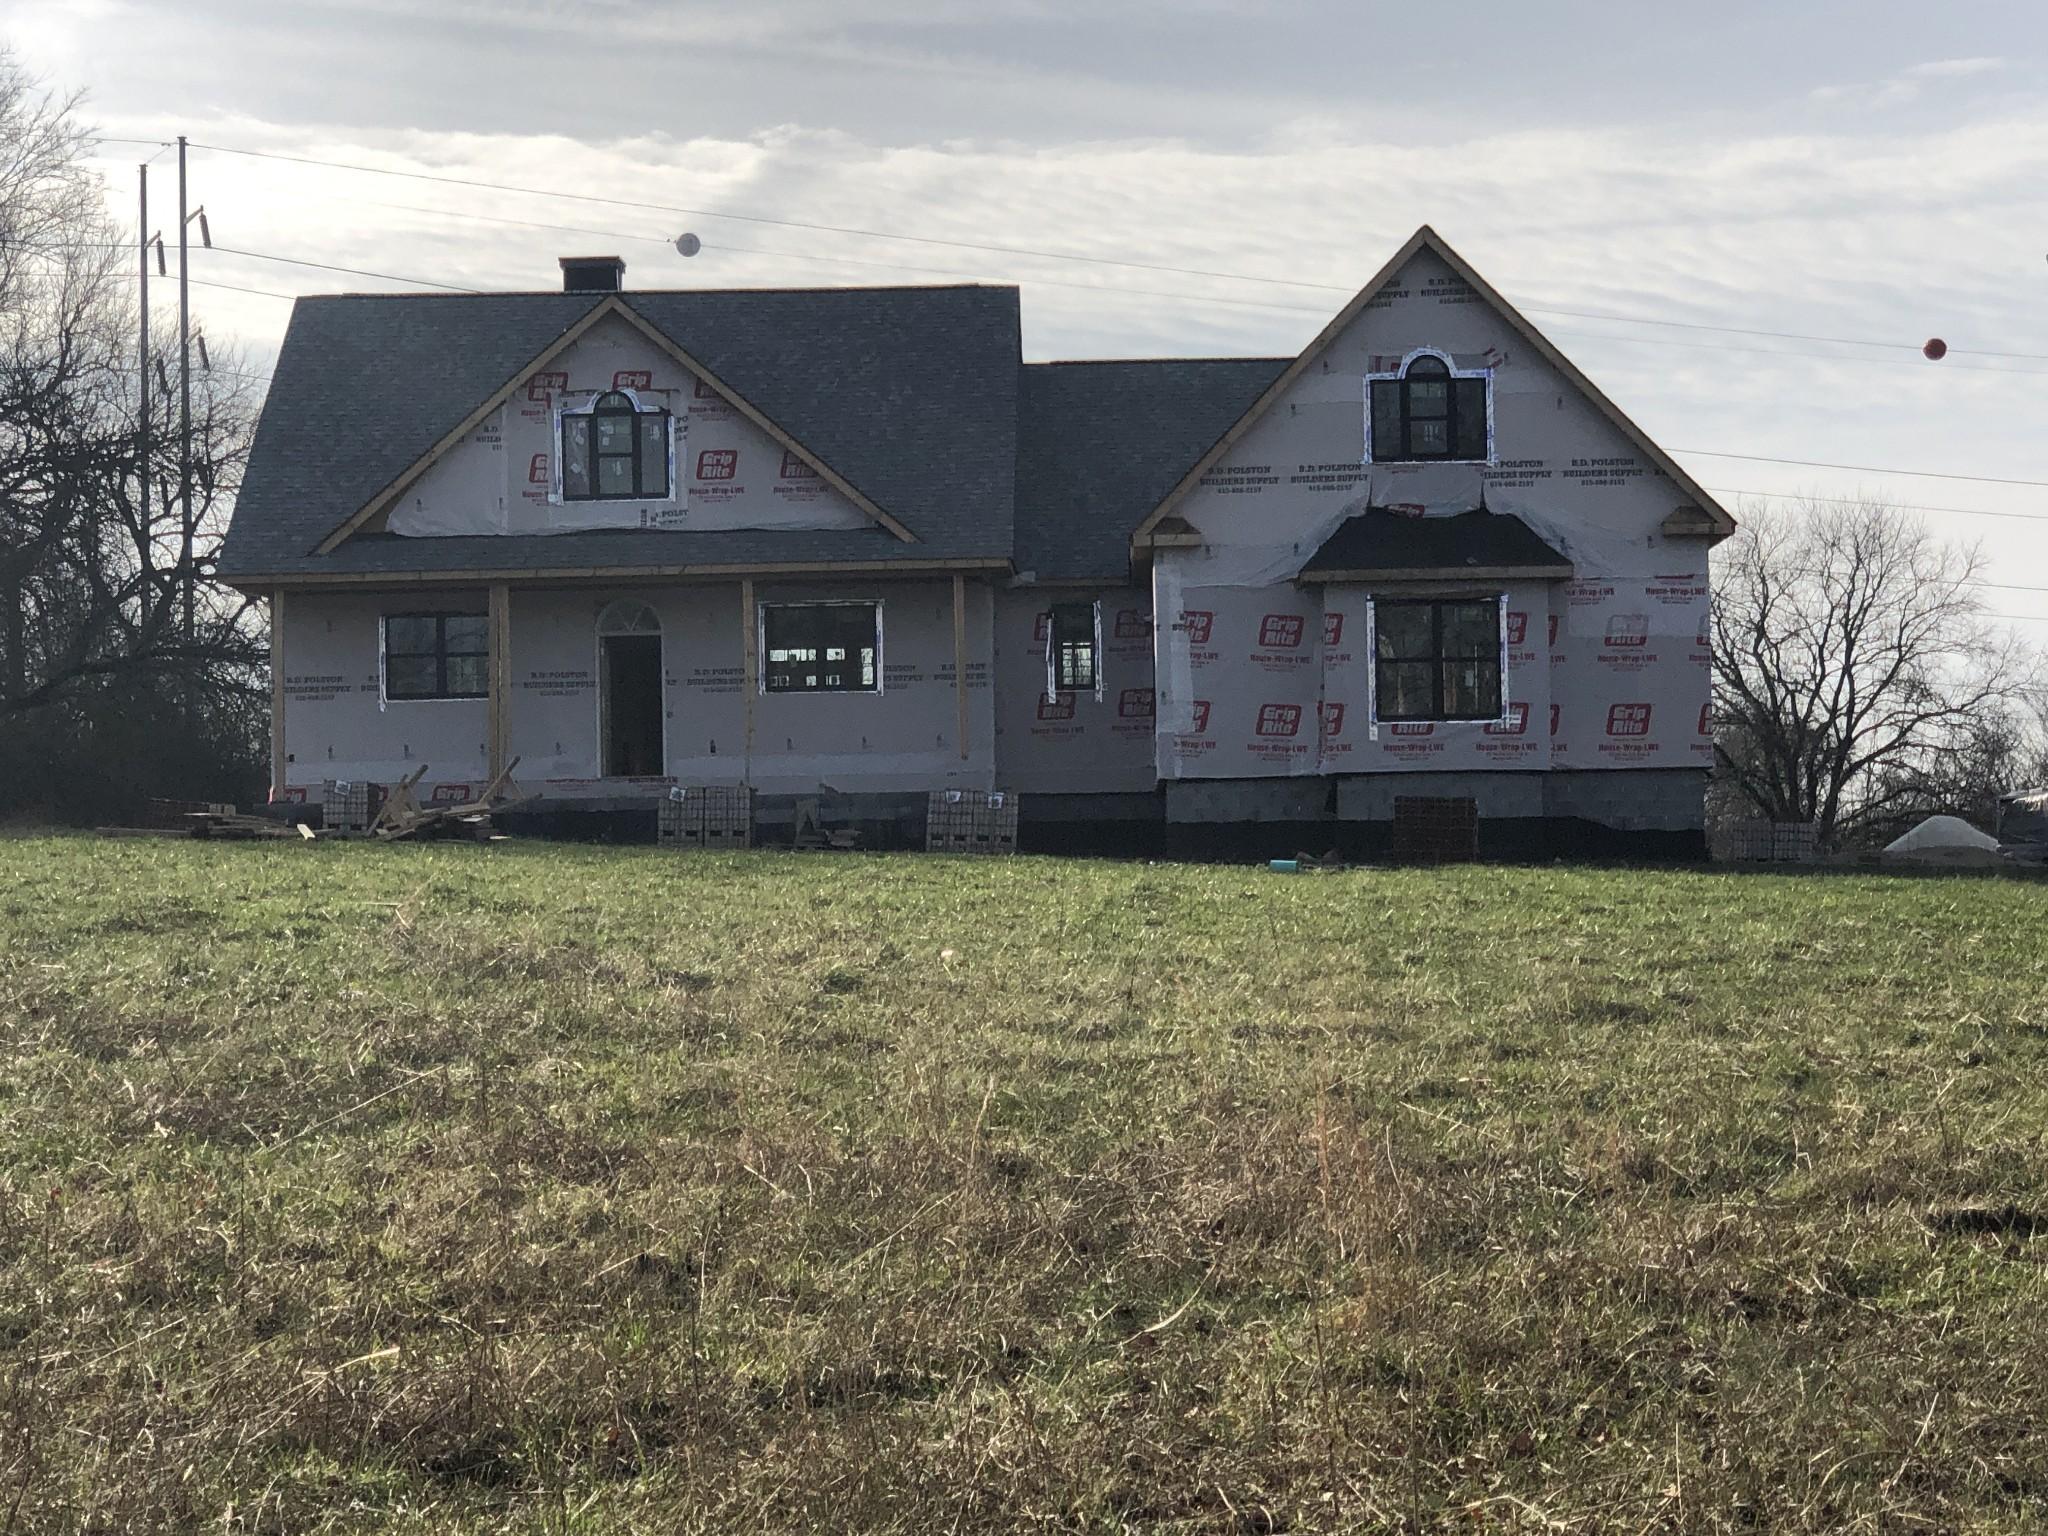 422 Newton Ln, Gallatin, TN 37066 - Gallatin, TN real estate listing